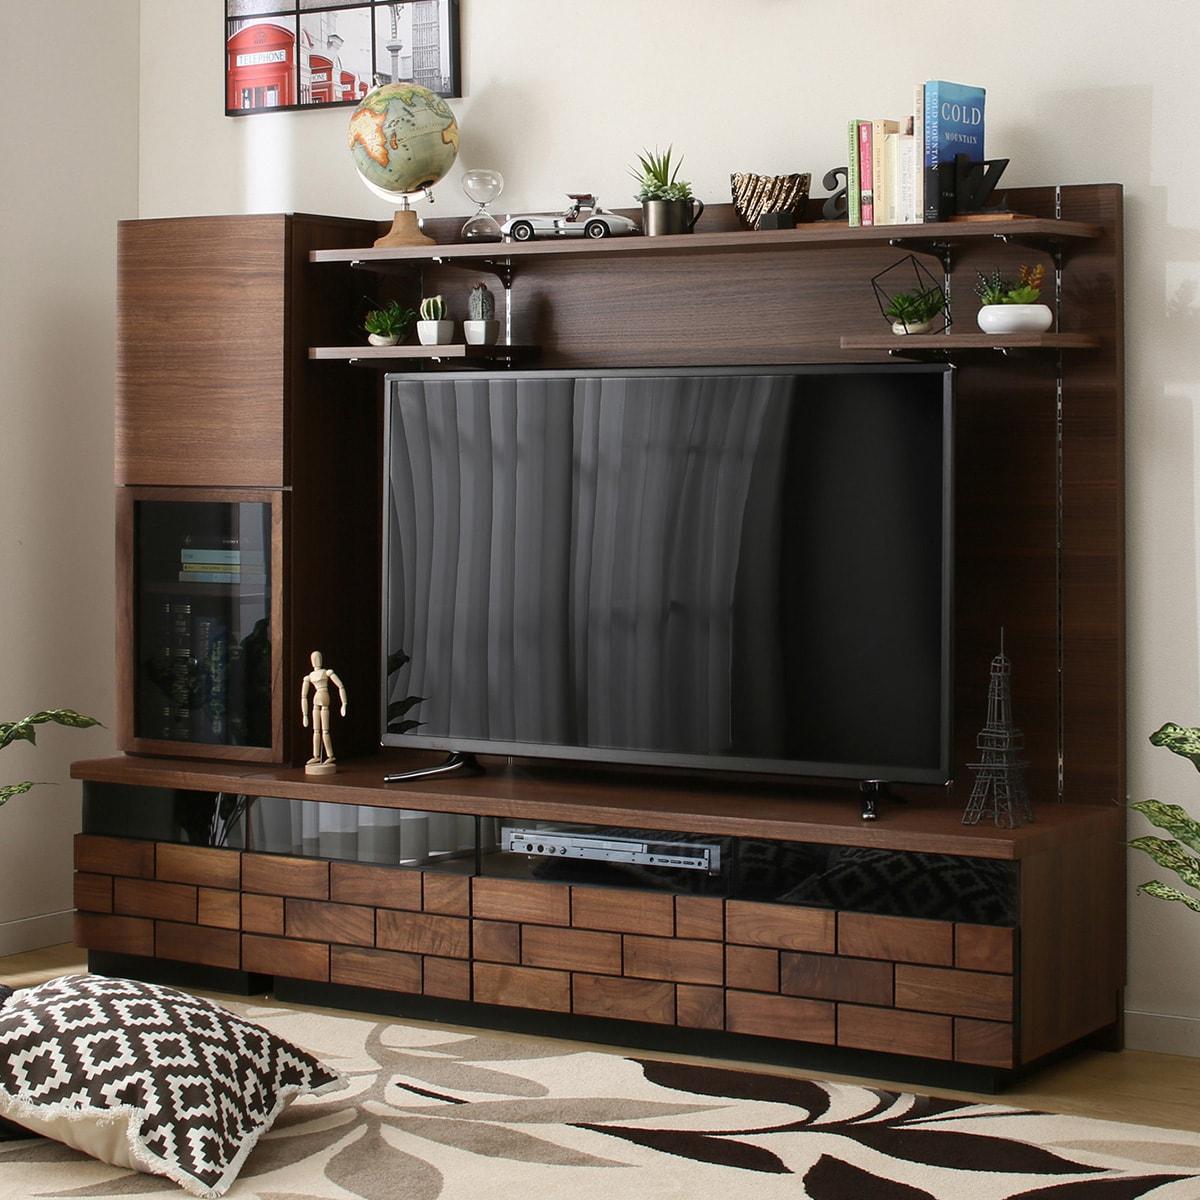 TVボードキャビネットセット(ブロリック 150 セット/ ブロリック40L セット) ニトリ 【完成品・配送員設置】 【5年保証】